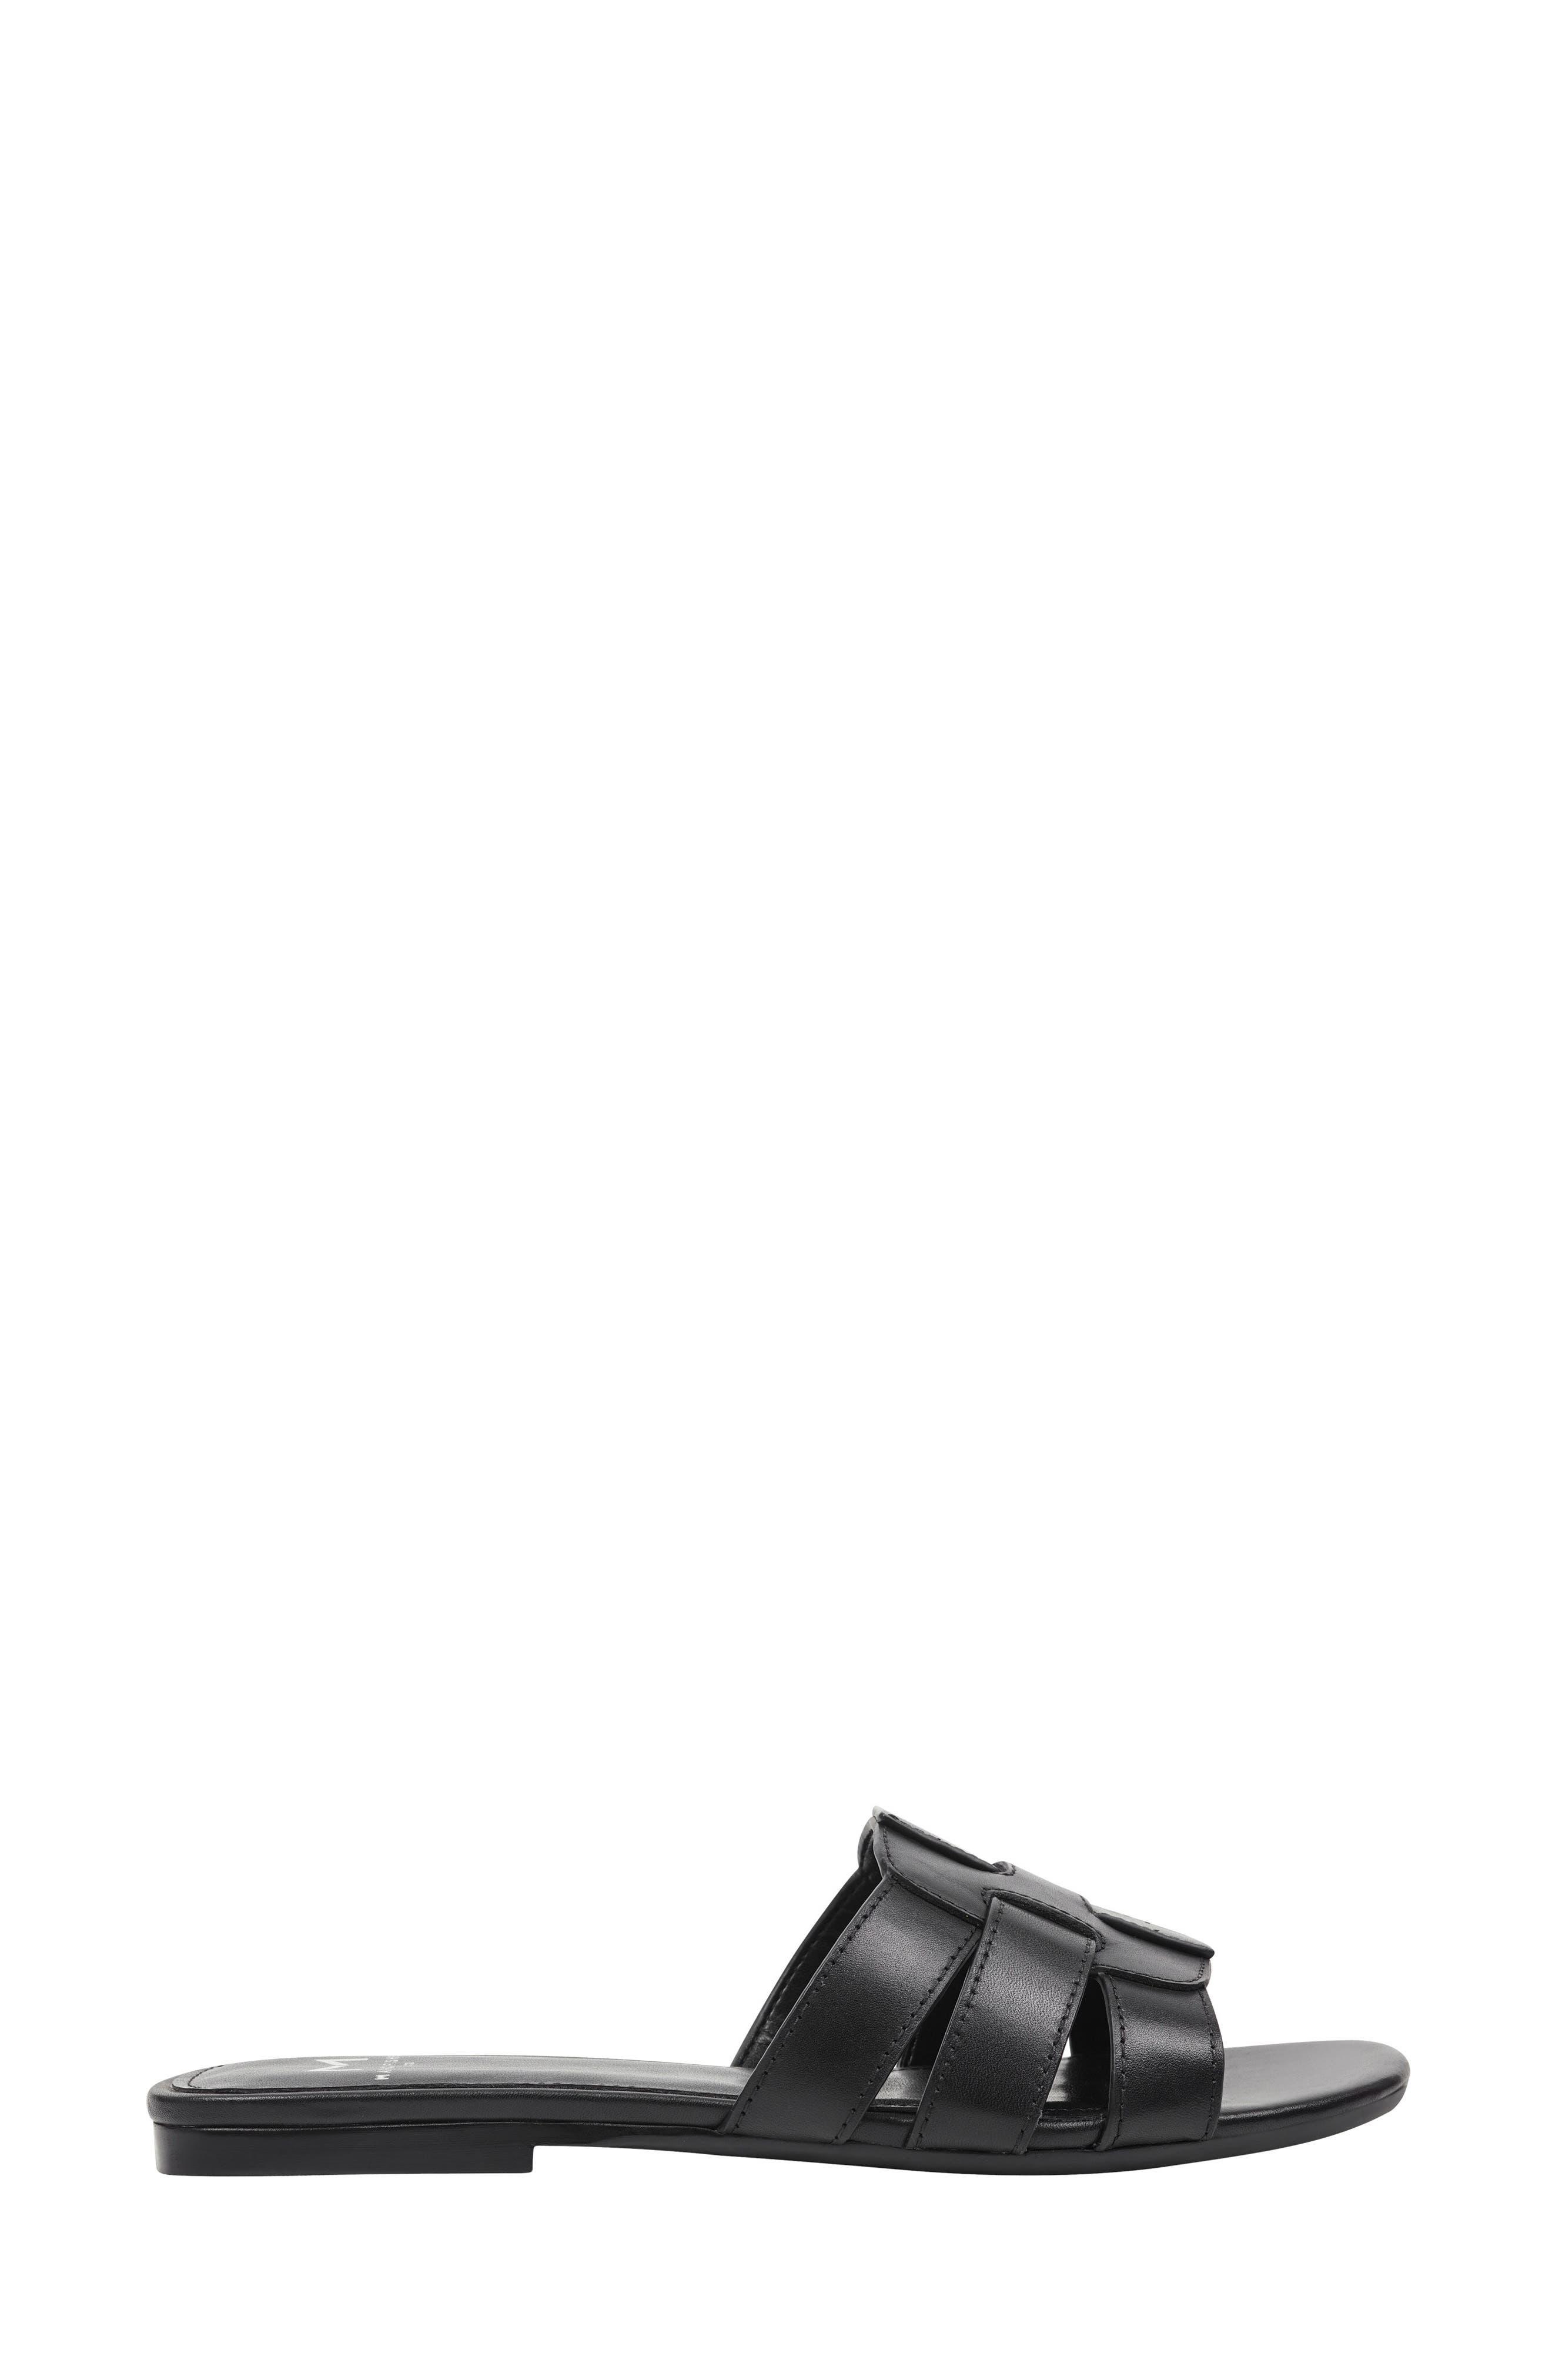 Kayli Slide Sandal,                             Alternate thumbnail 3, color,                             BLACK LEATHER LEATHER